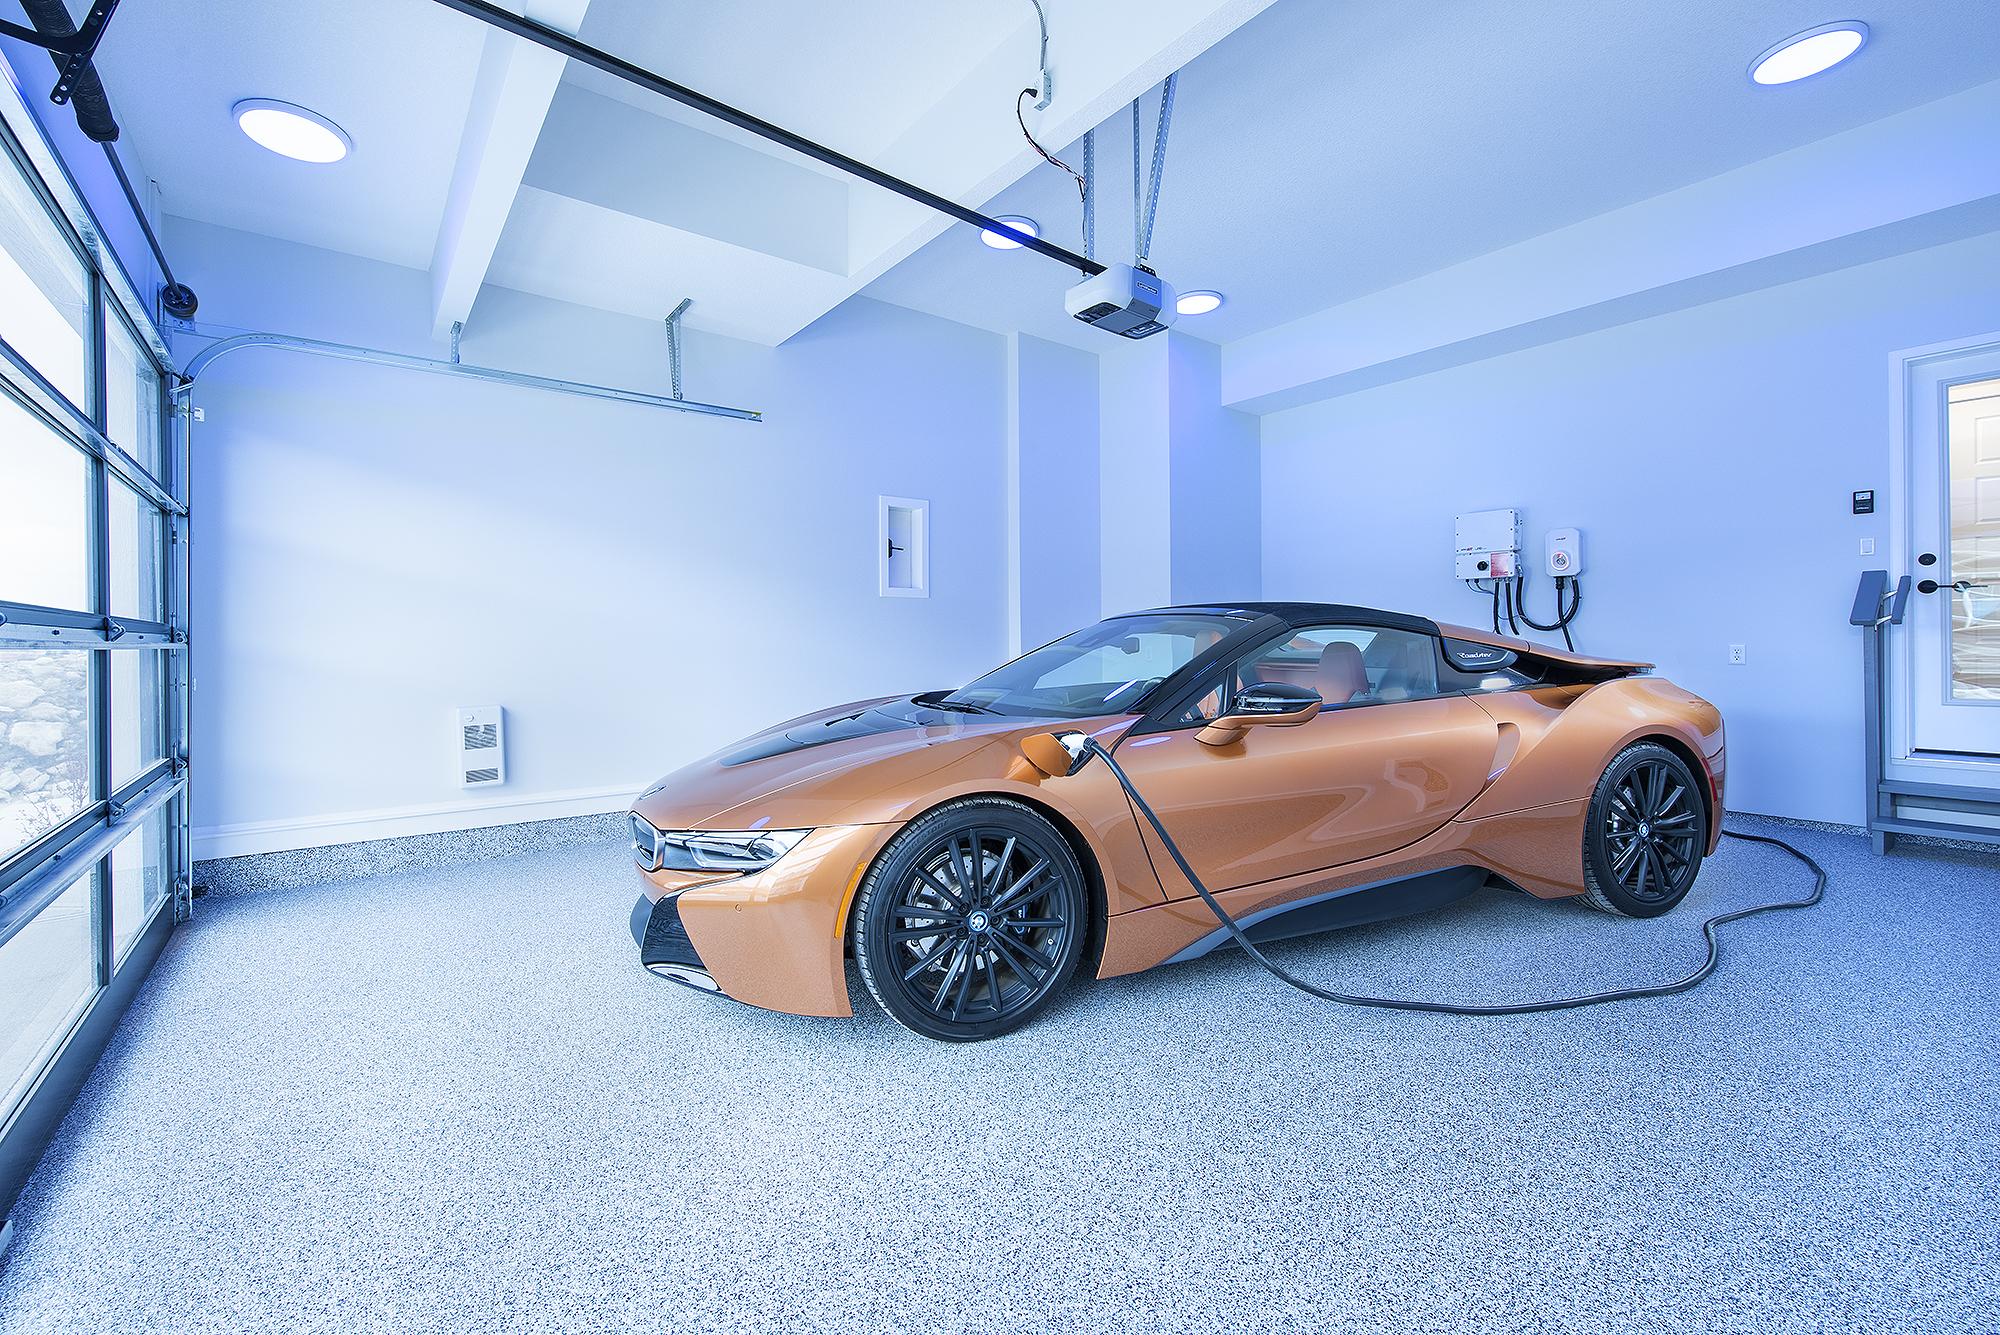 Net Zero home electric vehicle charging